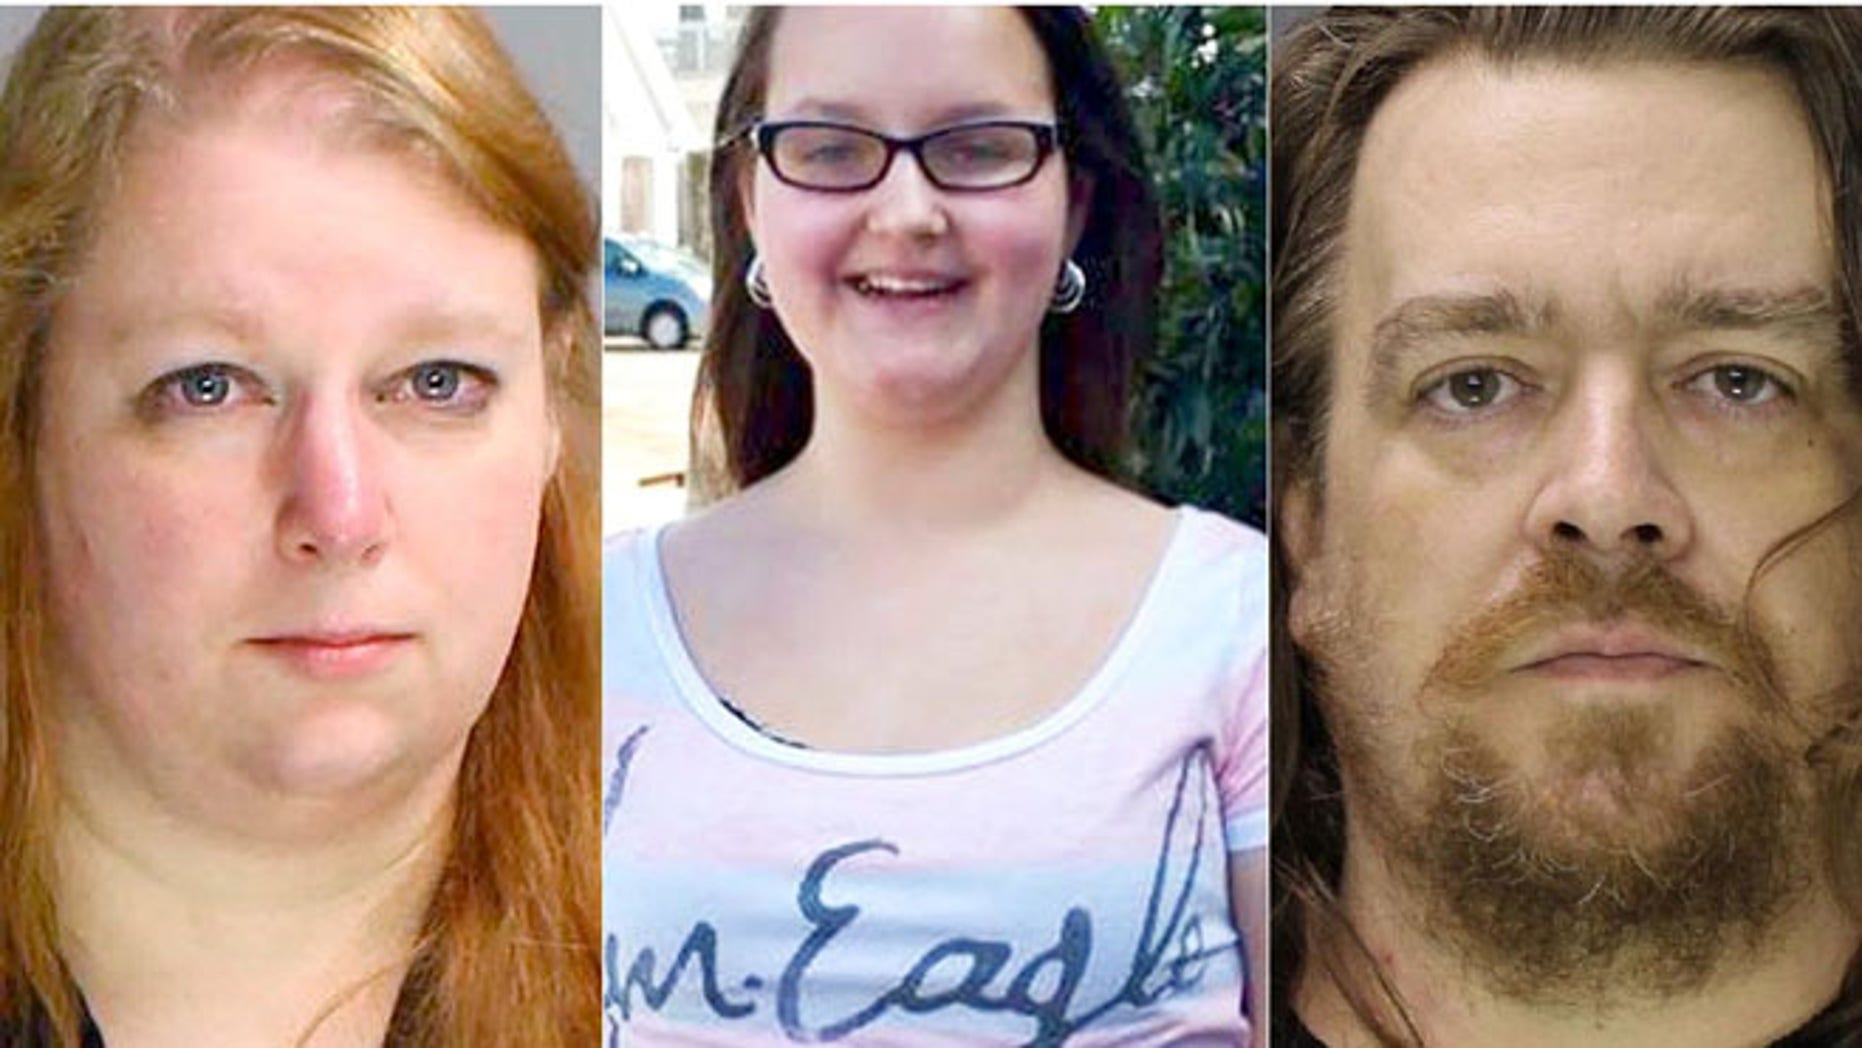 Photos of Sara Packer, 41, Grace Packer, 14, and Jacob Sullivan, 44. (Bucks County Prosecutor's Office)